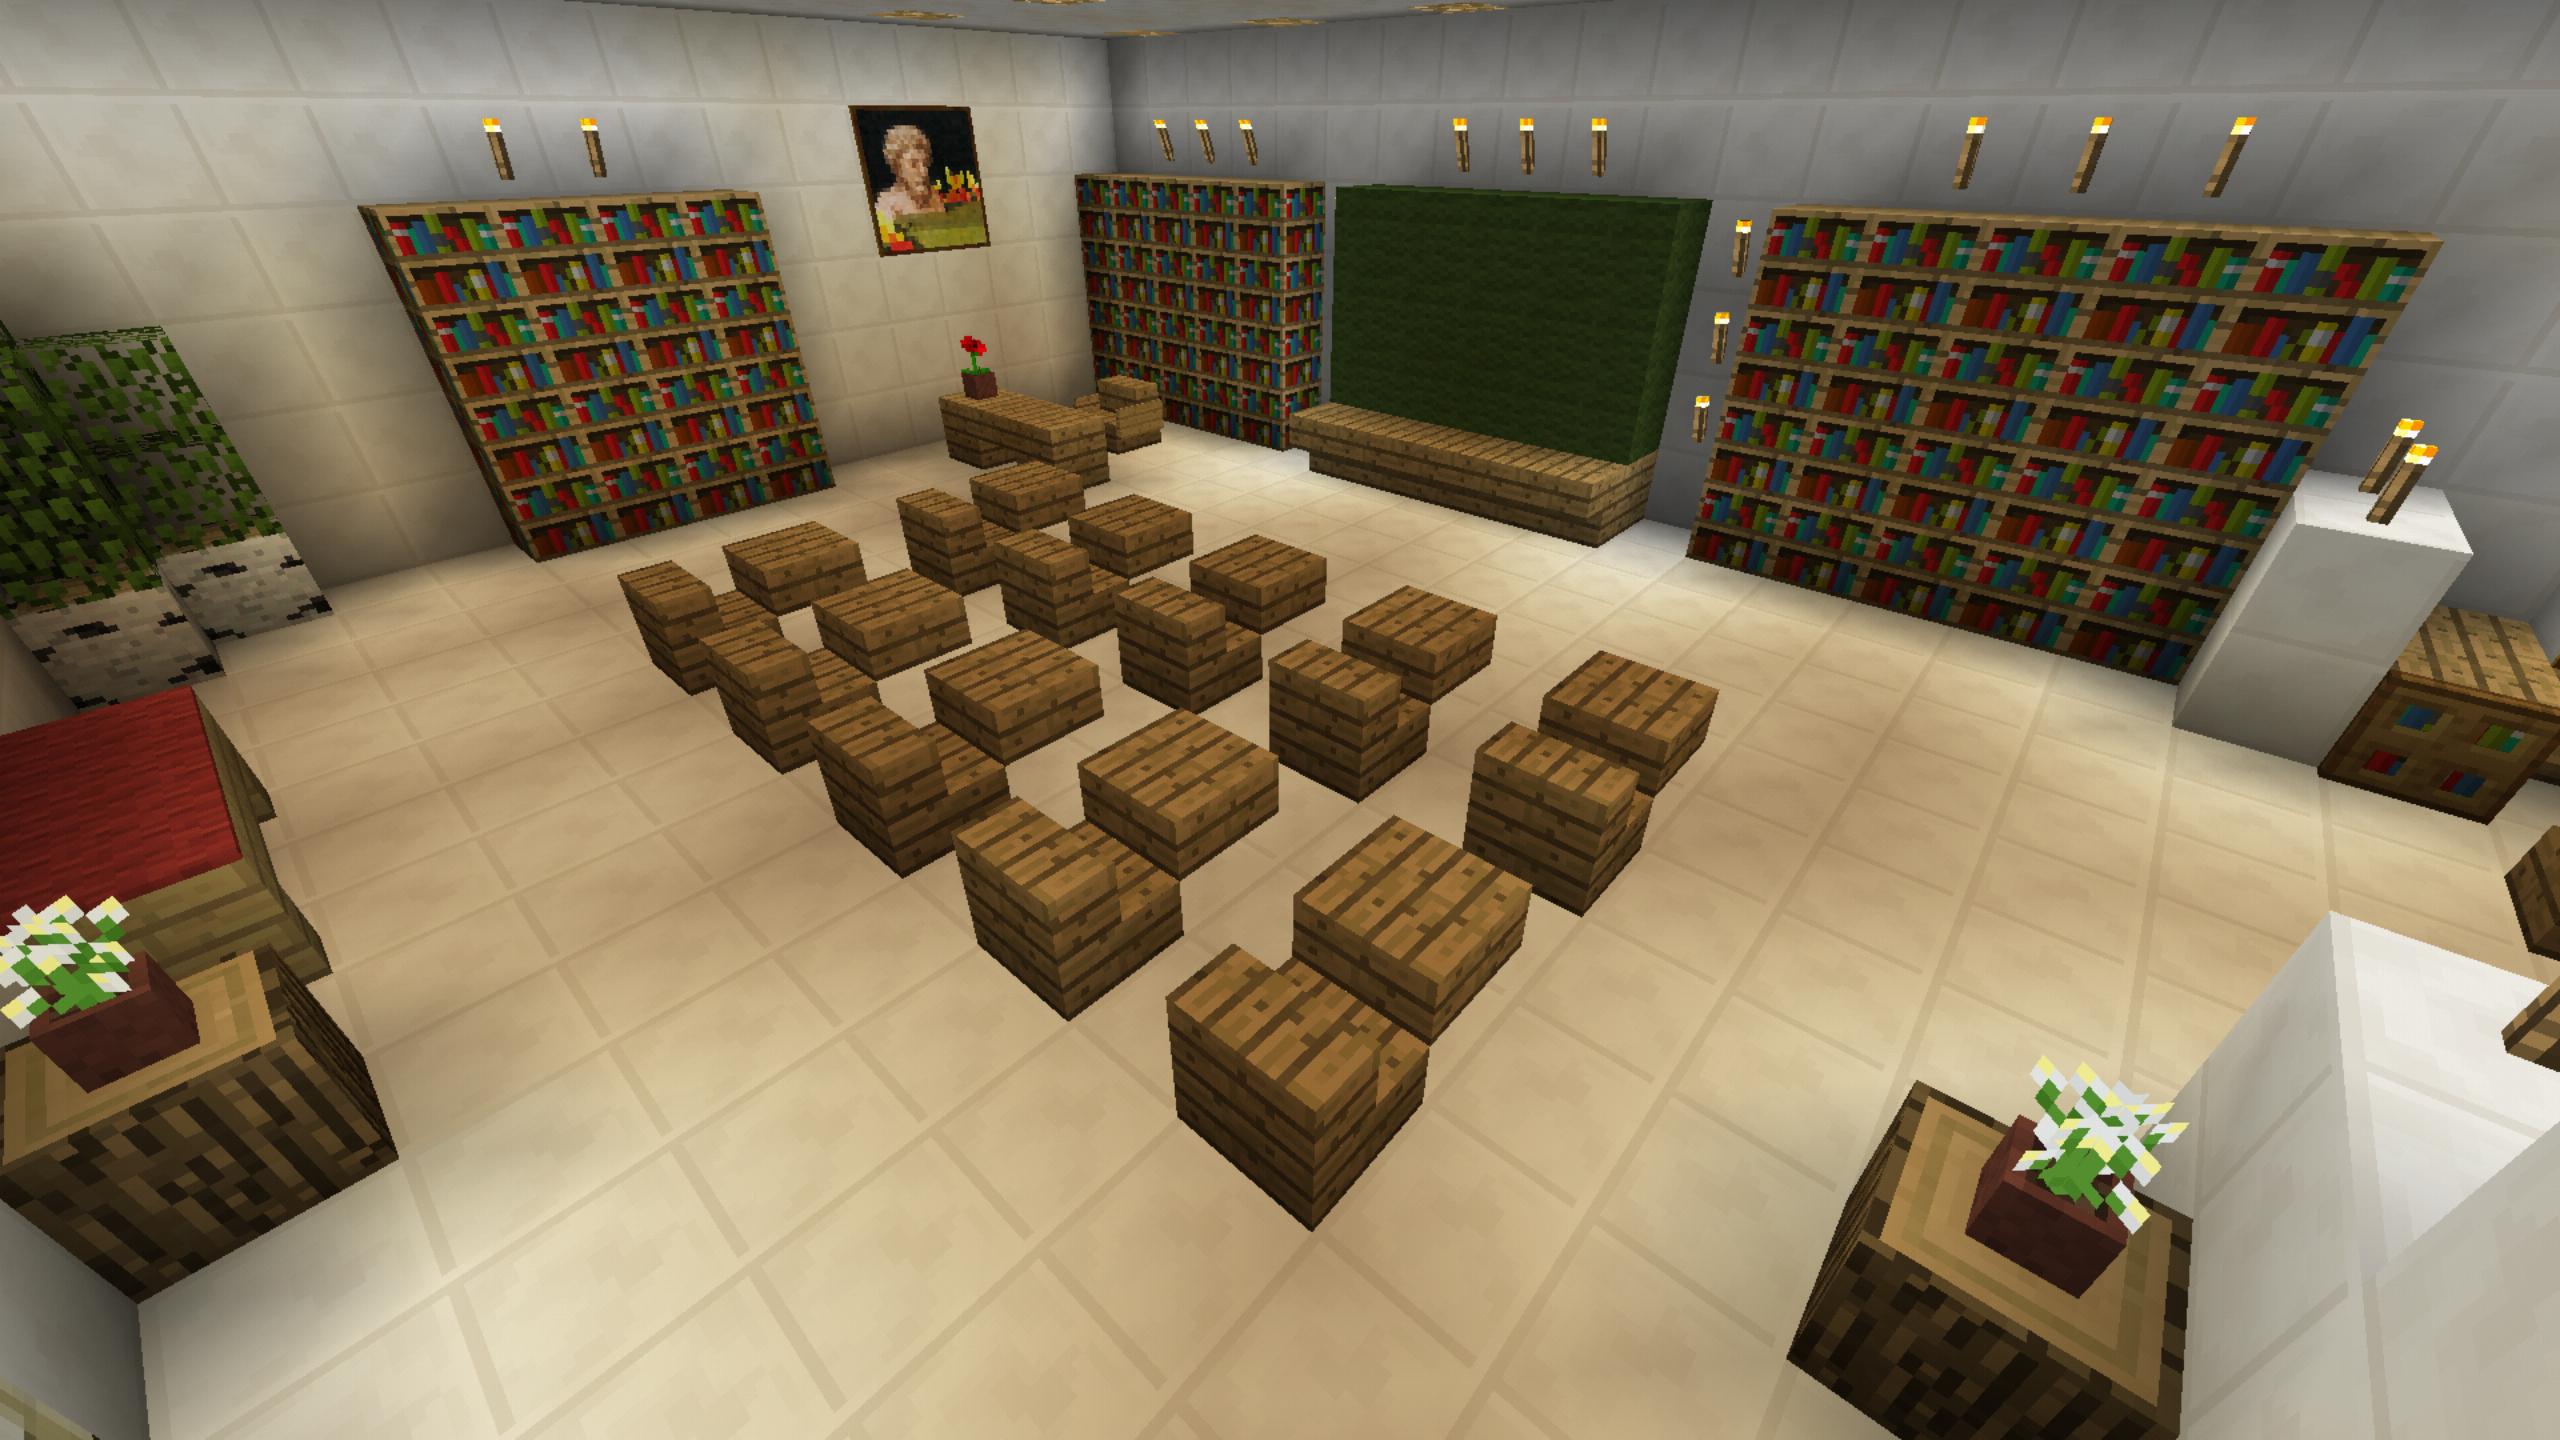 Minecraft School Classroom Desk Lab Furniture Minecraft School Minecraft Room Minecraft Designs